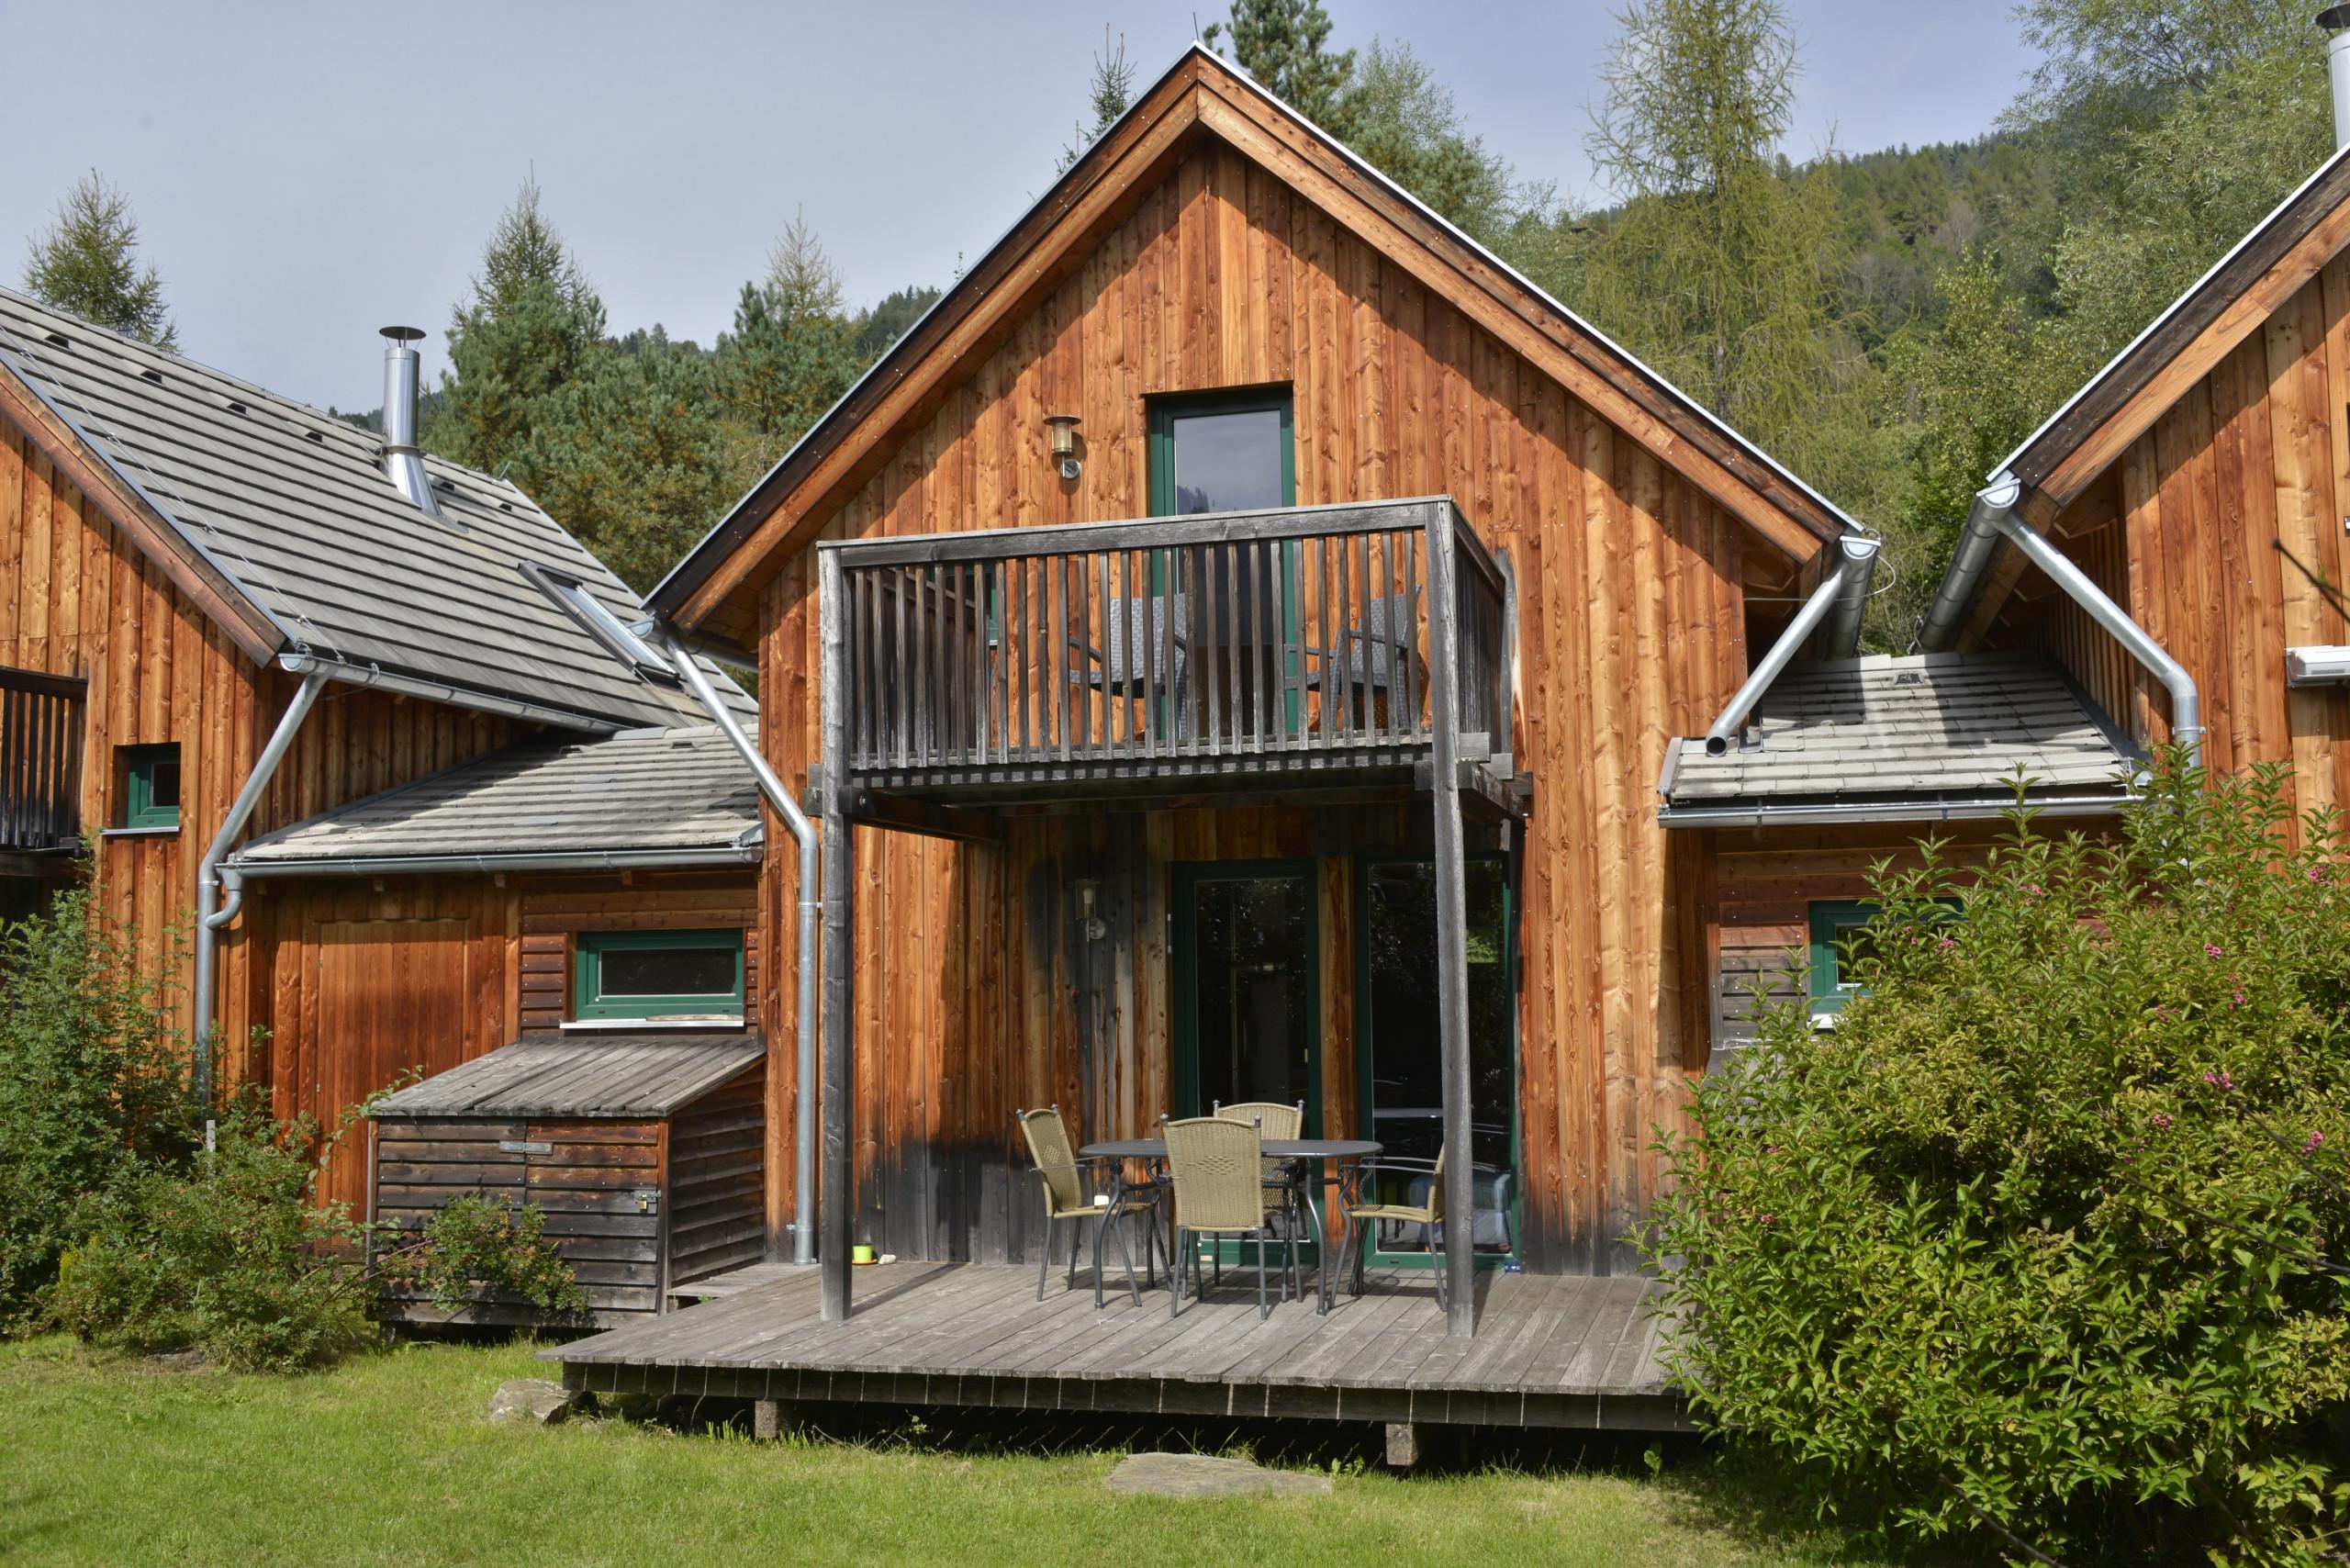 Ferienhaus Familie Terrasse Sommerurlaub